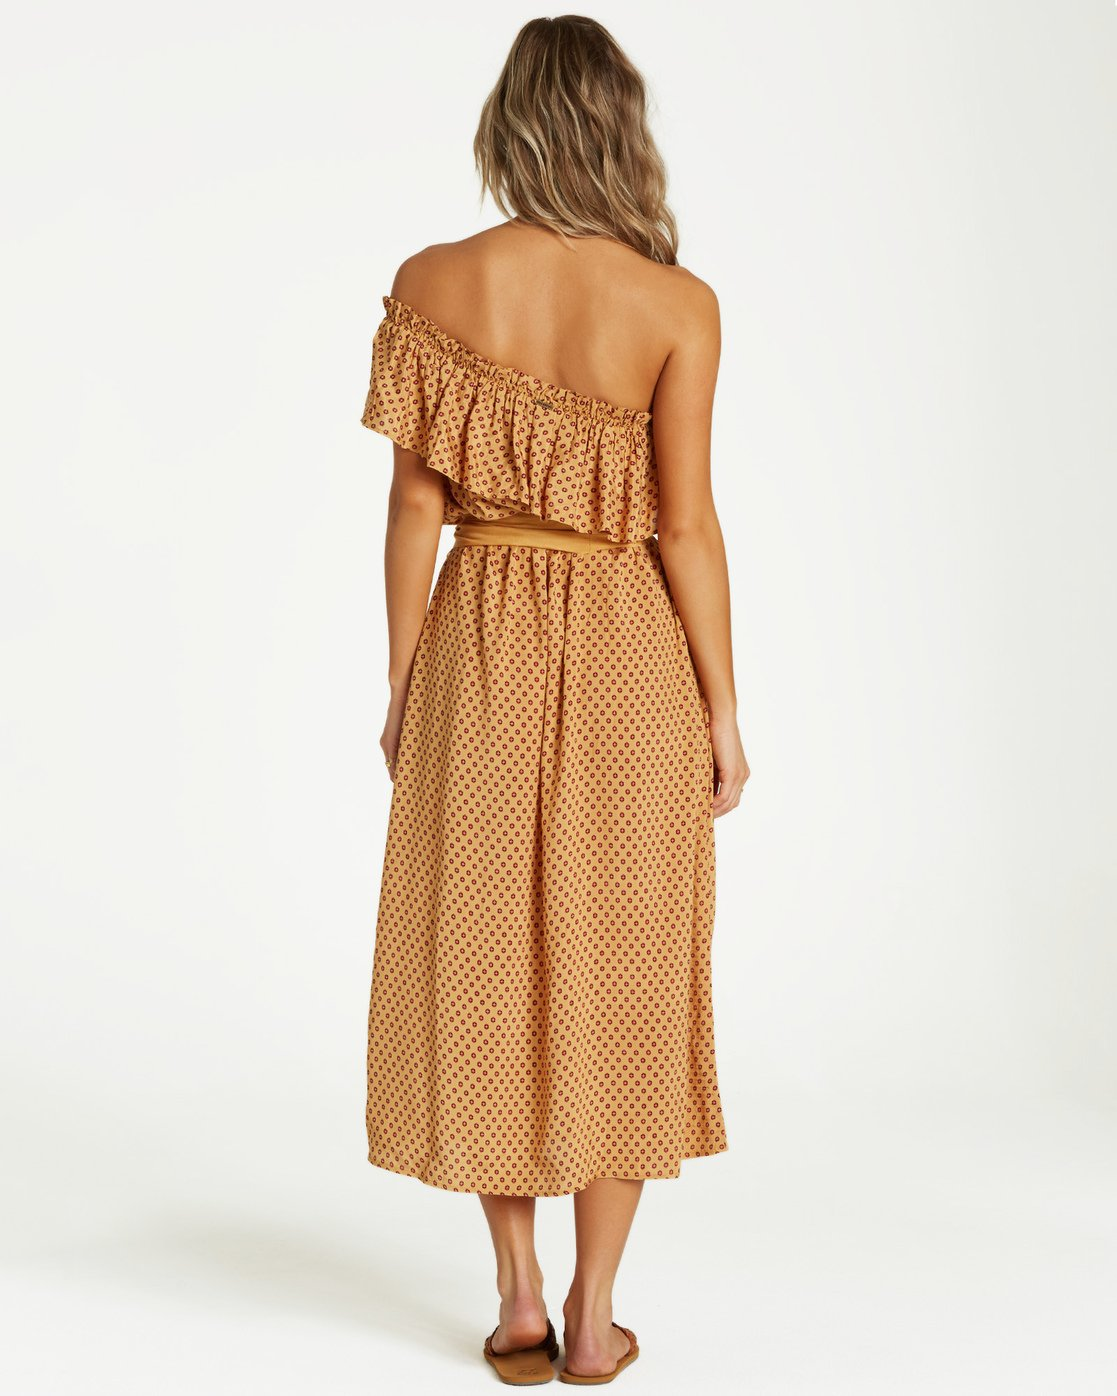 Sash Around Mini Dress